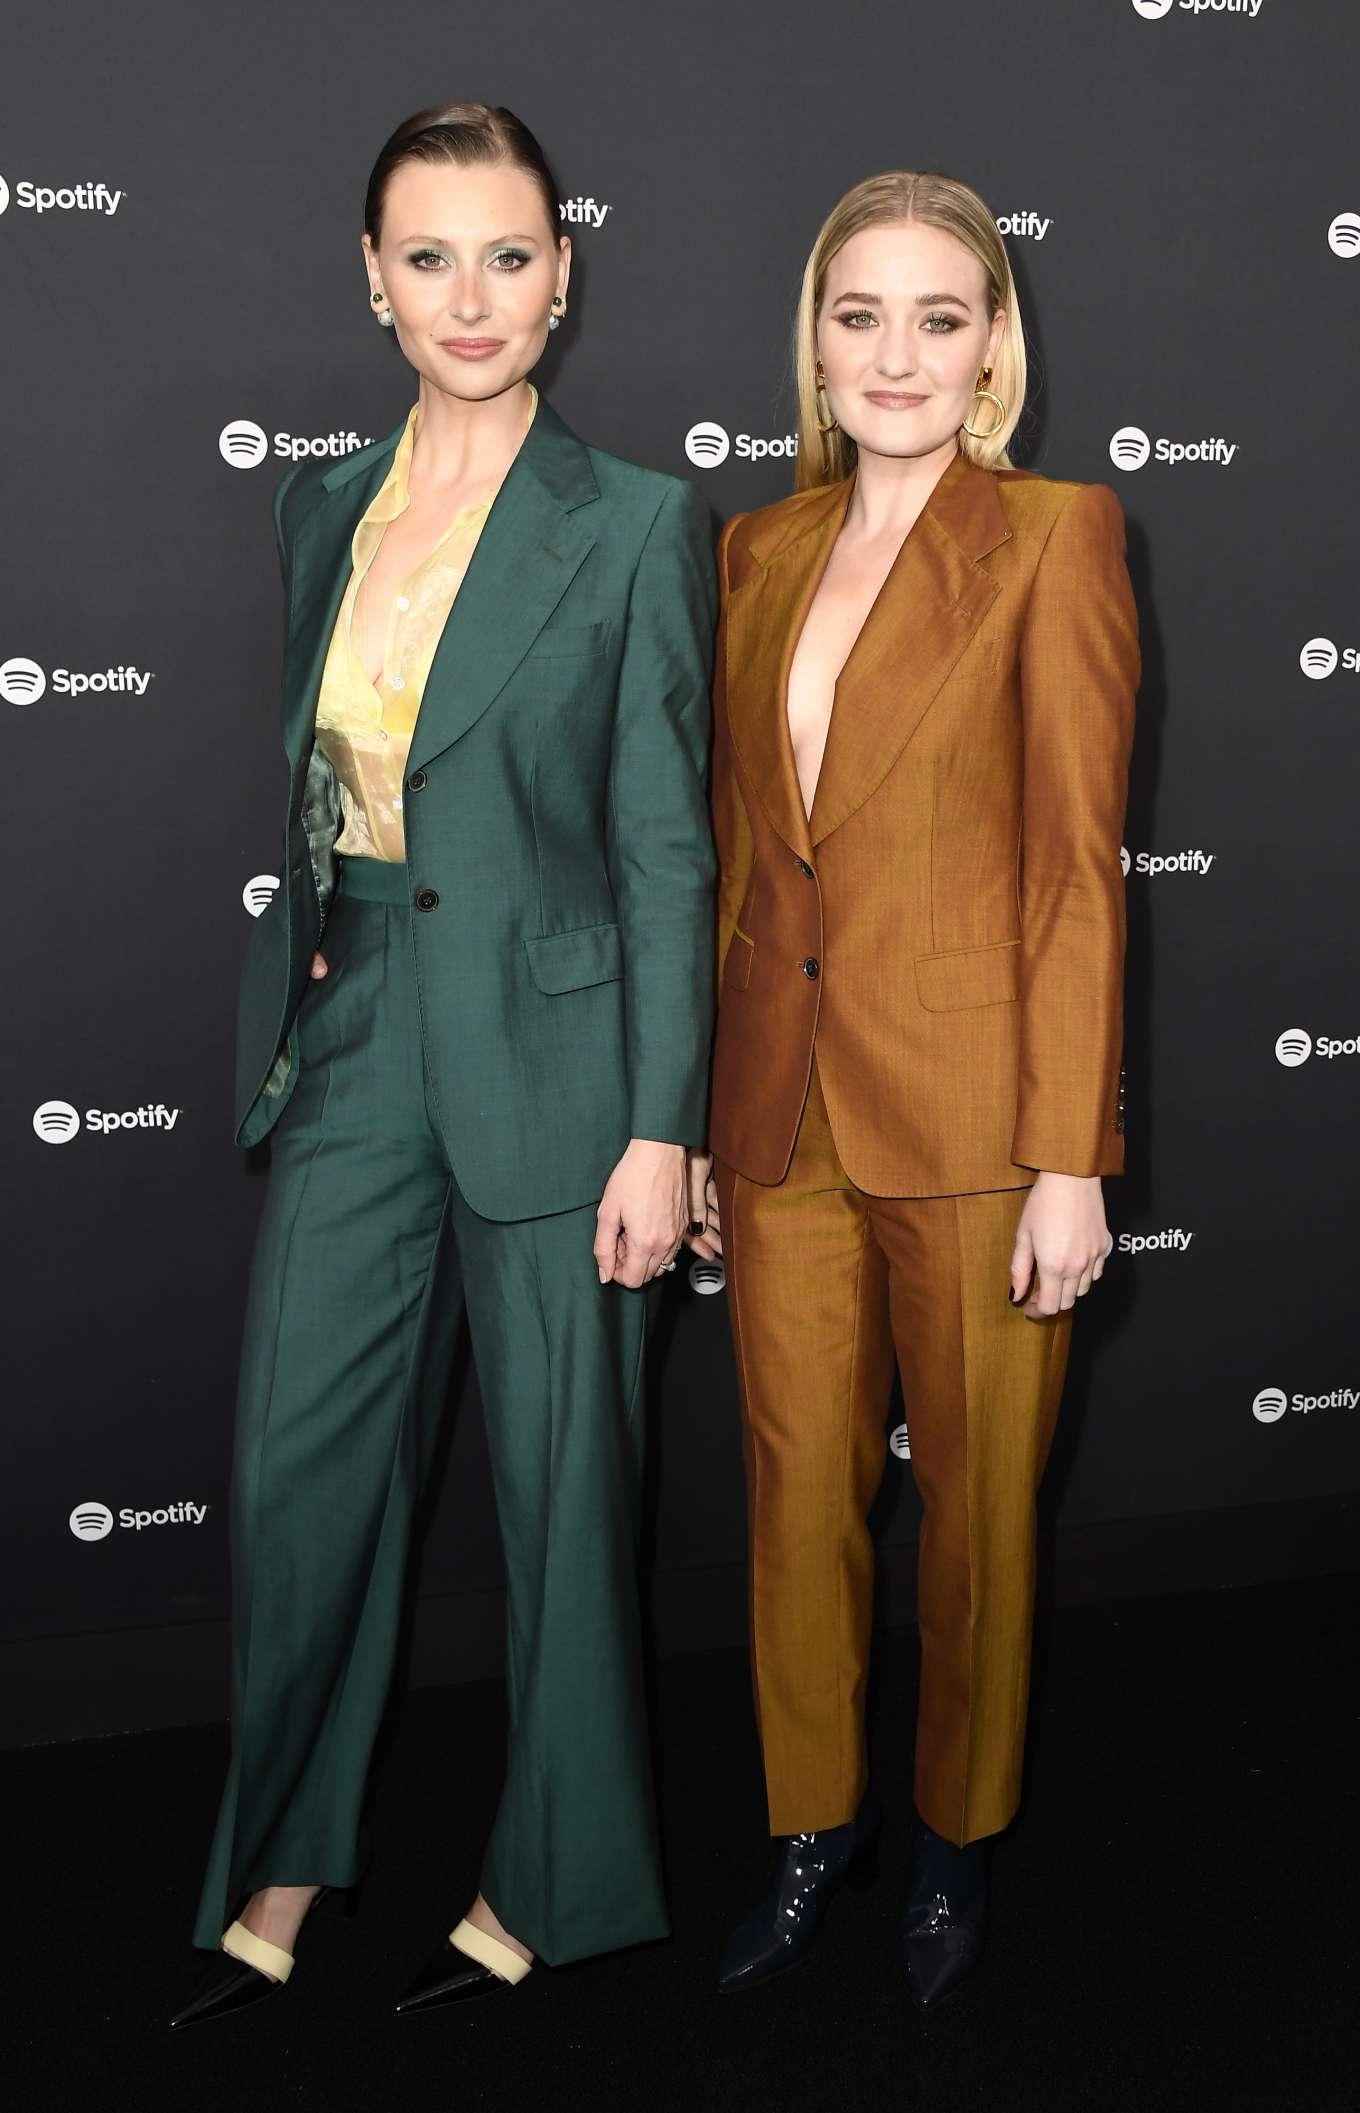 AJ Michalka 2020 : AJ Michalka and Aly Michalka – Spotify Best New Artist Party-12